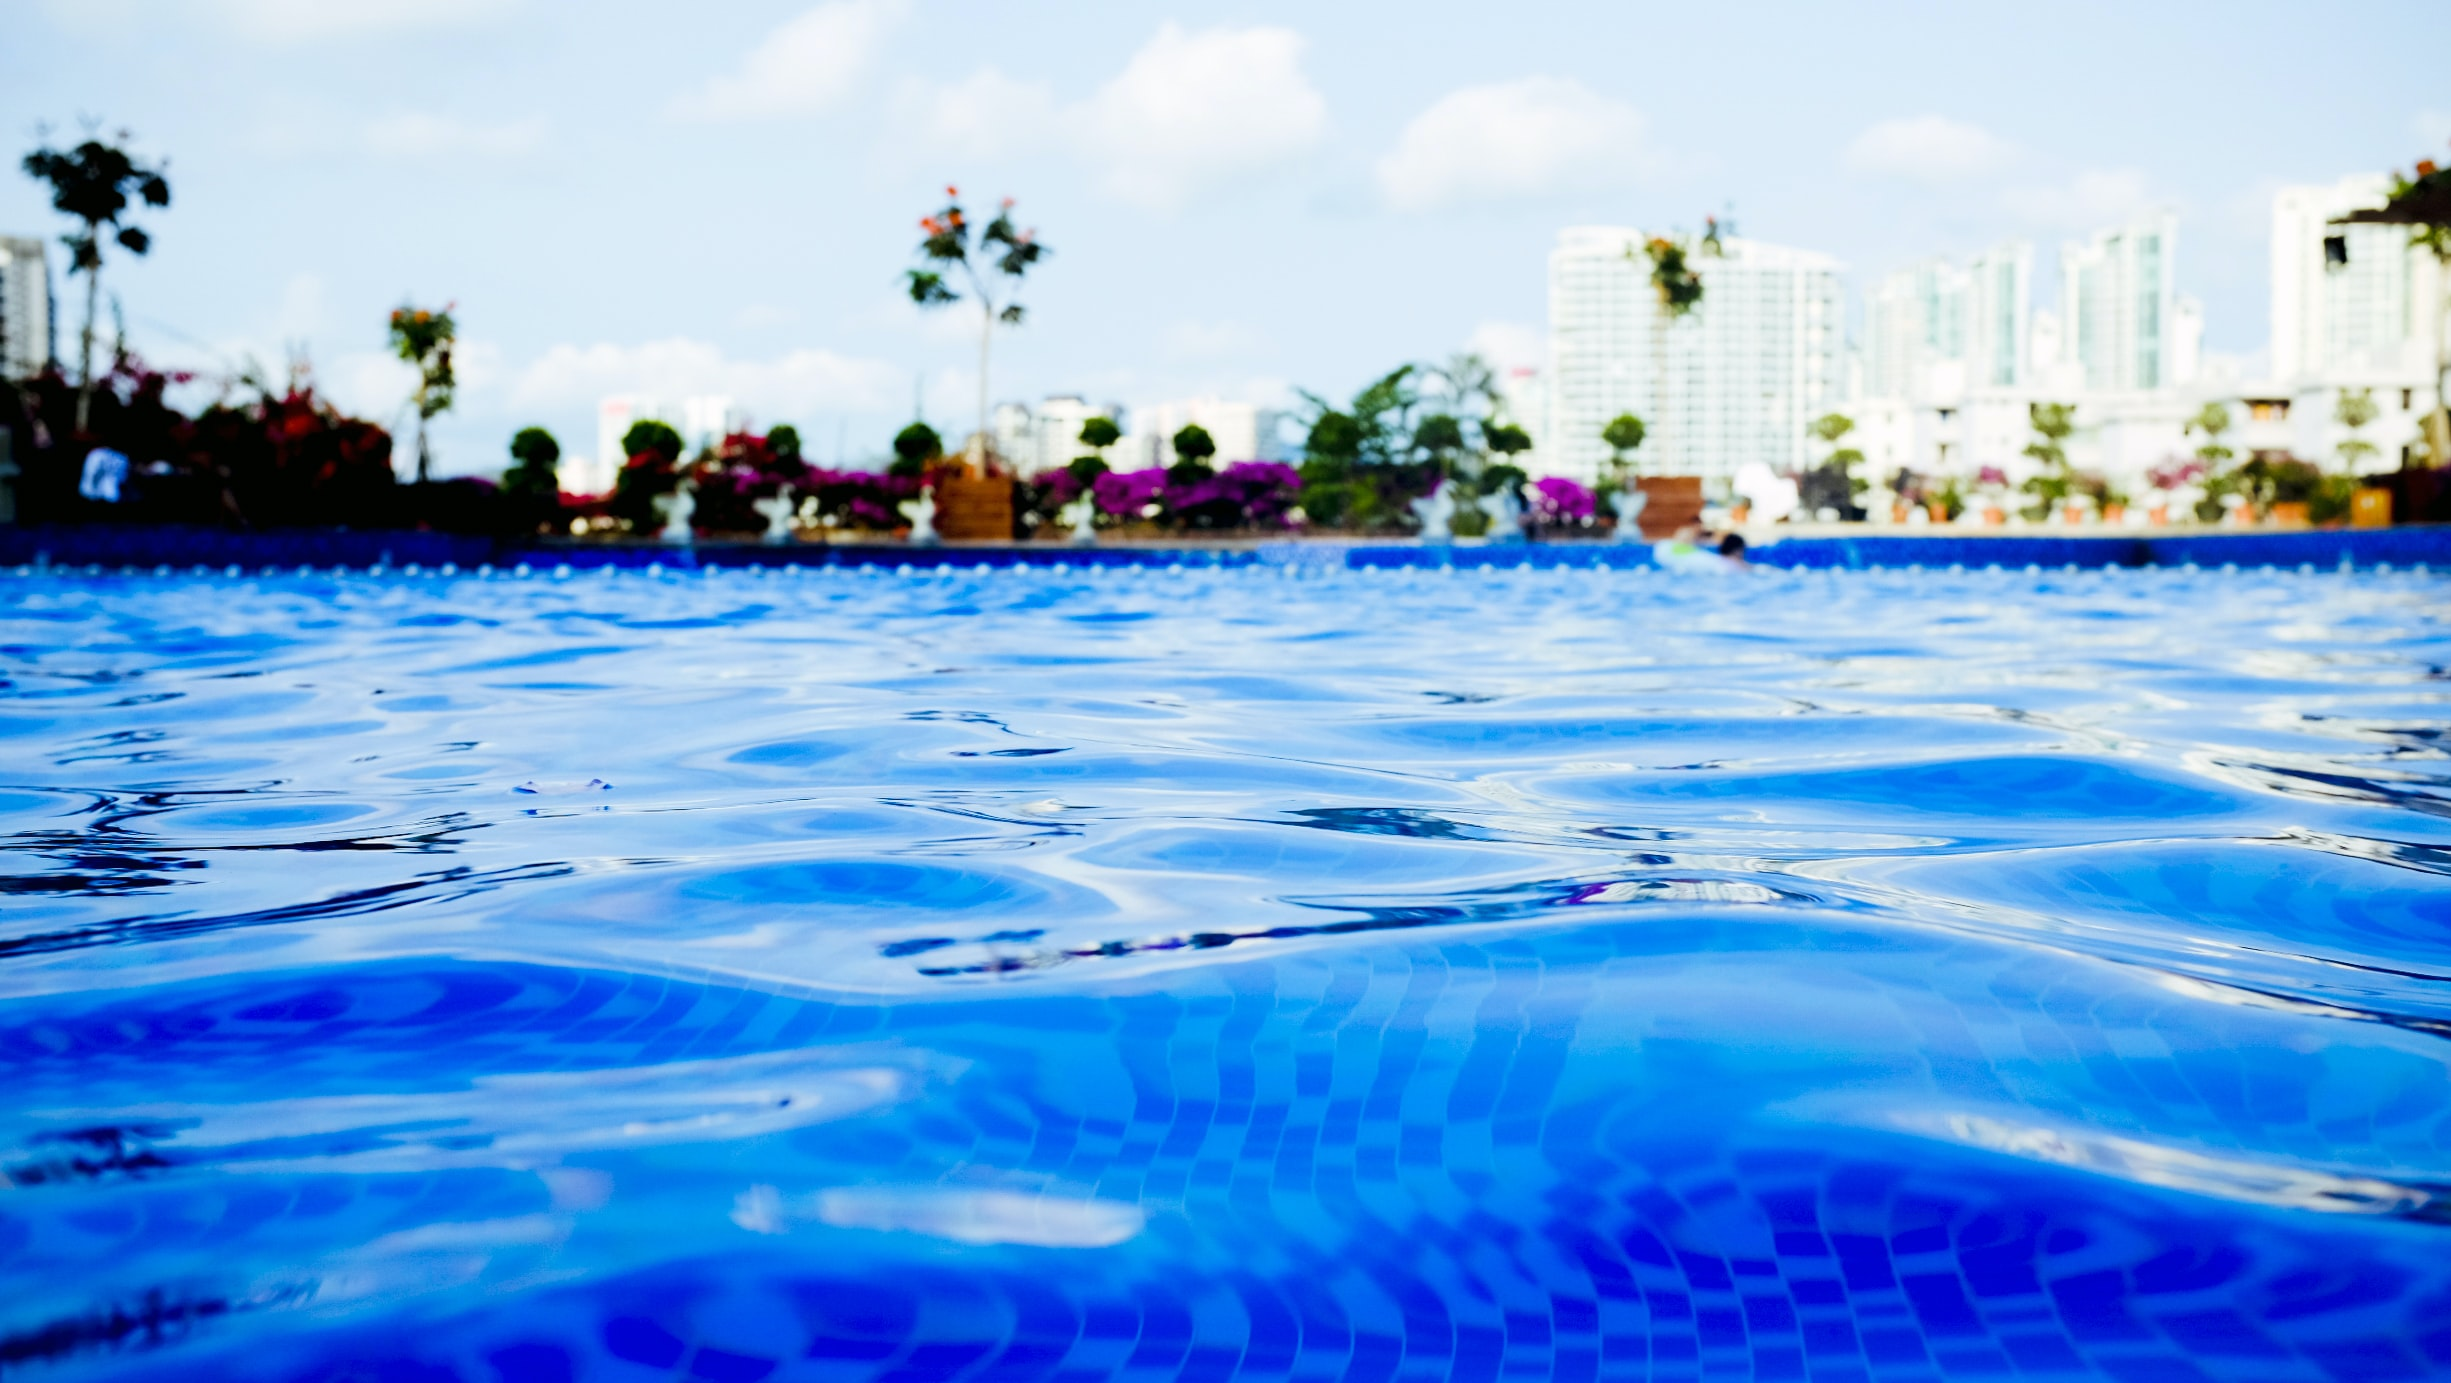 blue swimming pool near tree at daytime